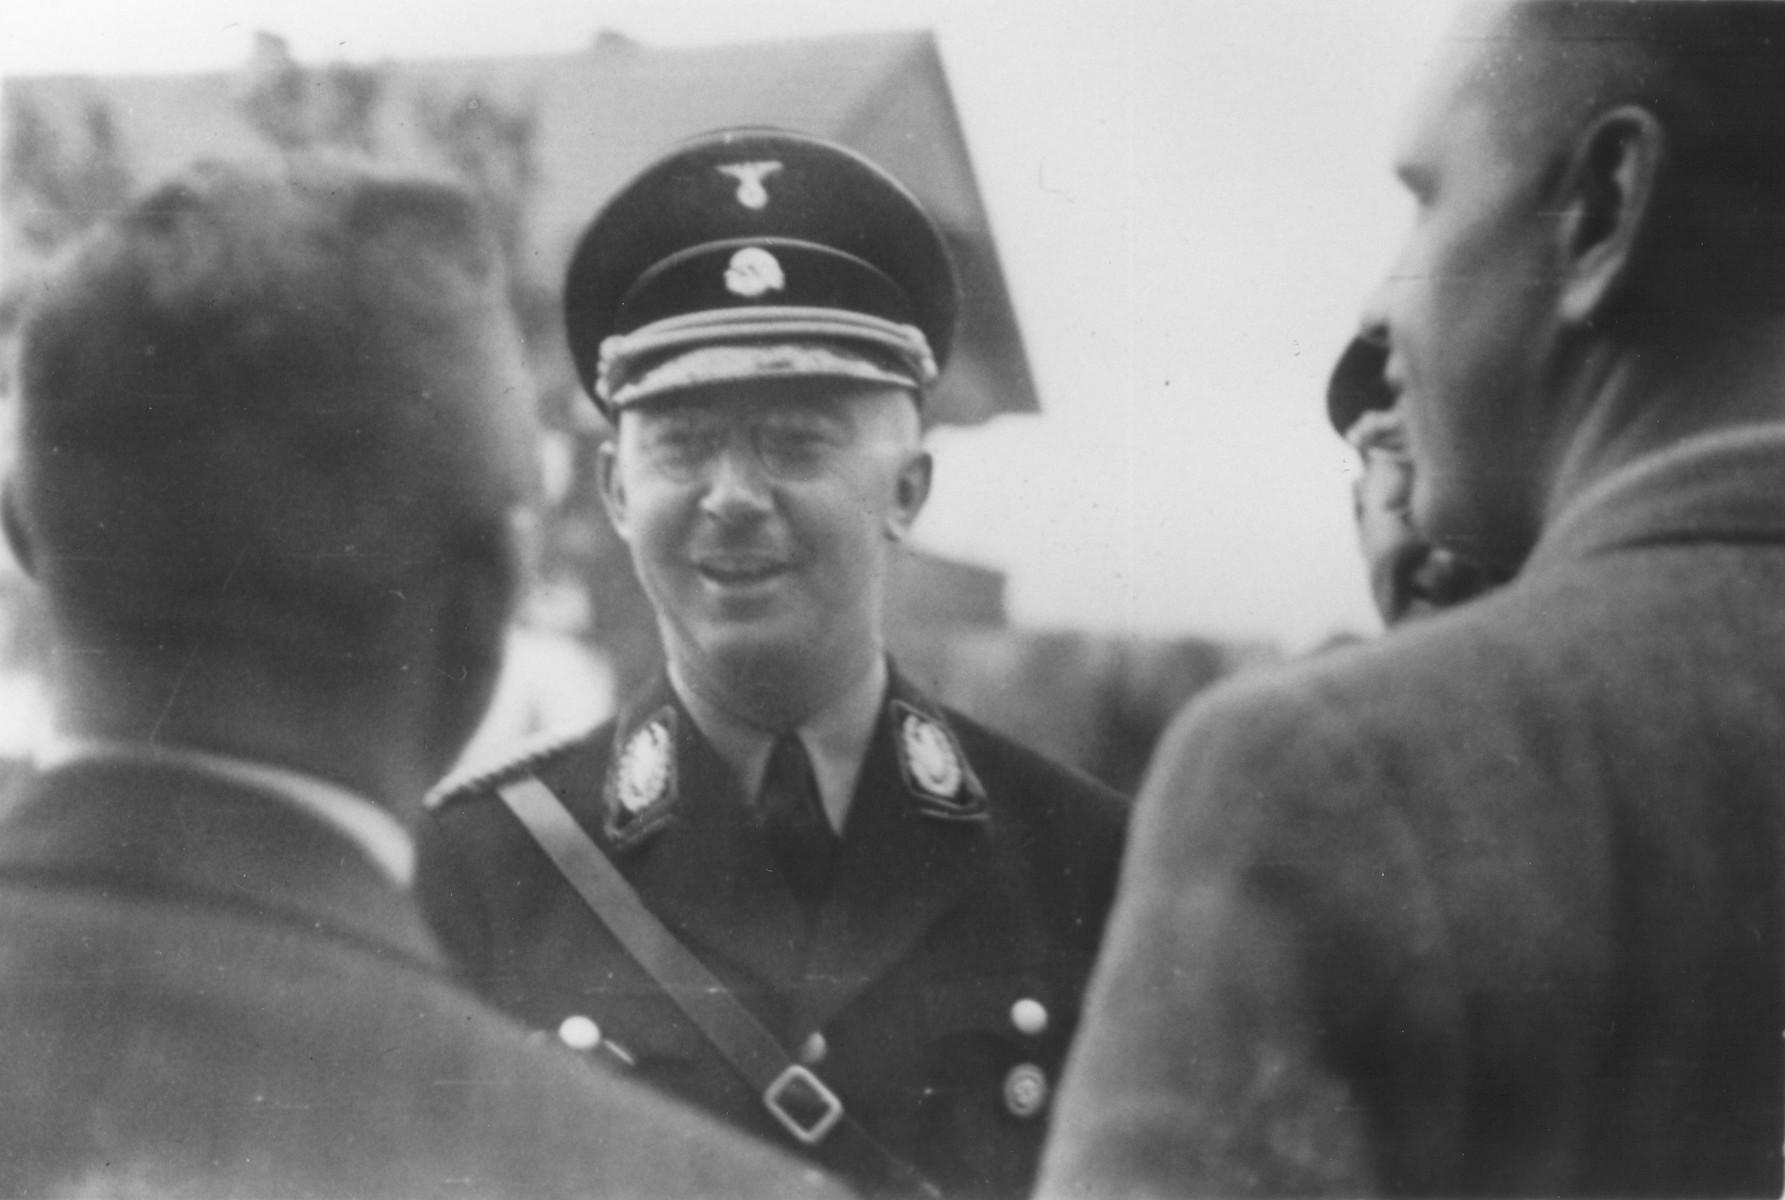 Reichsfuehrer-SS Heinrich Himmler converses with two civilians.